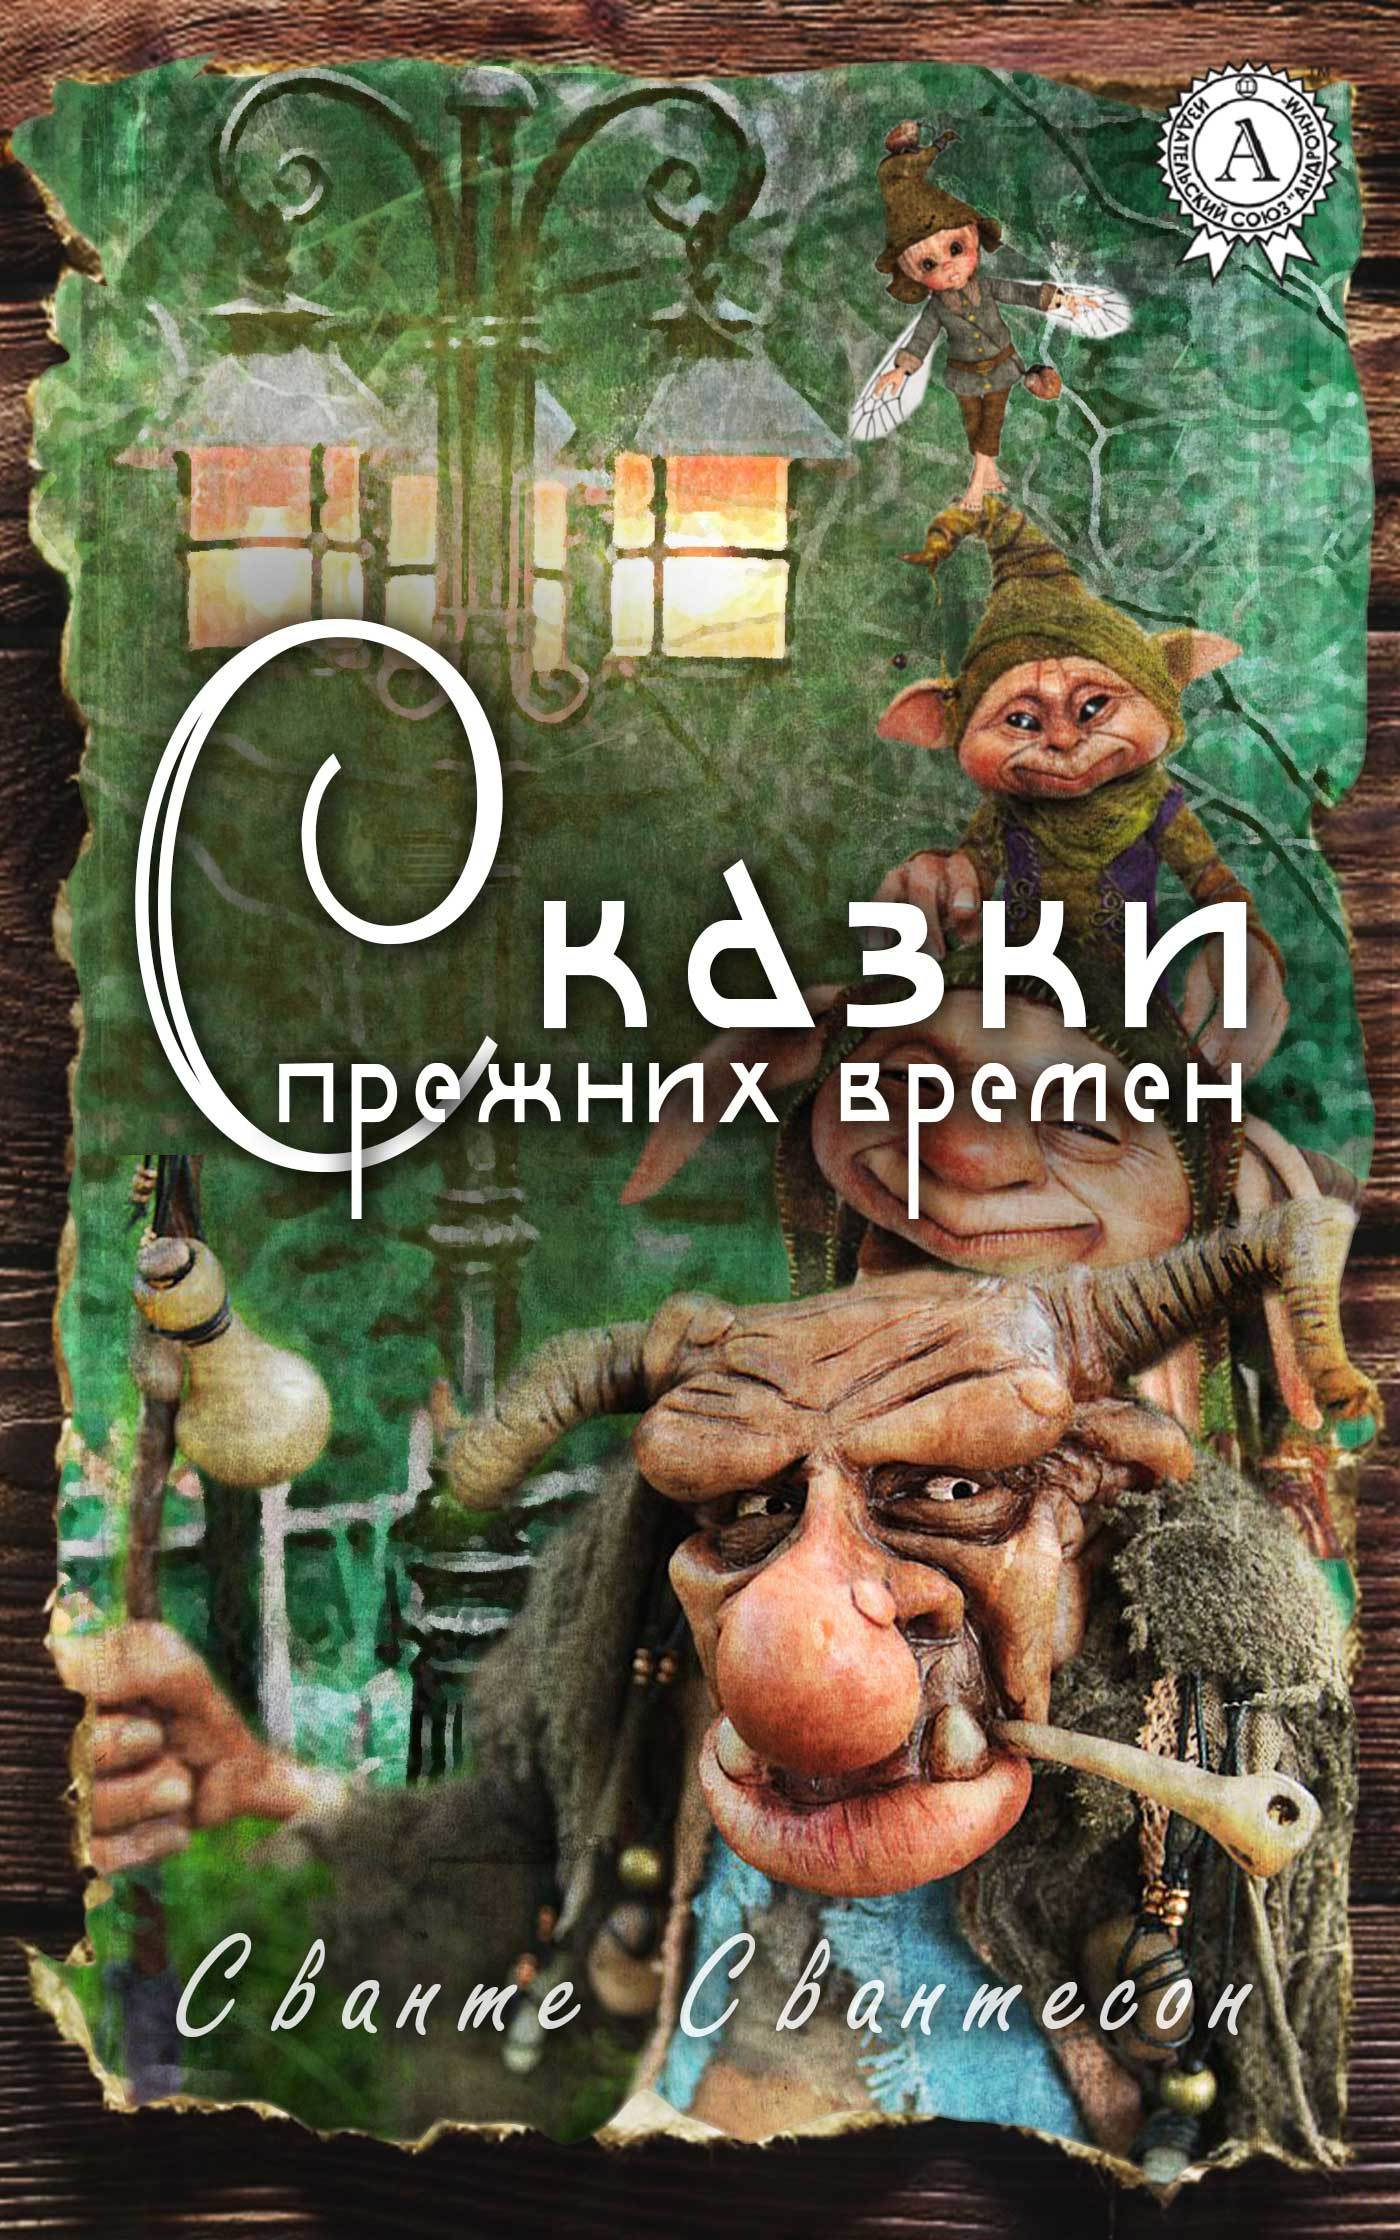 Сванте Свантесон - Сказки прежних времен